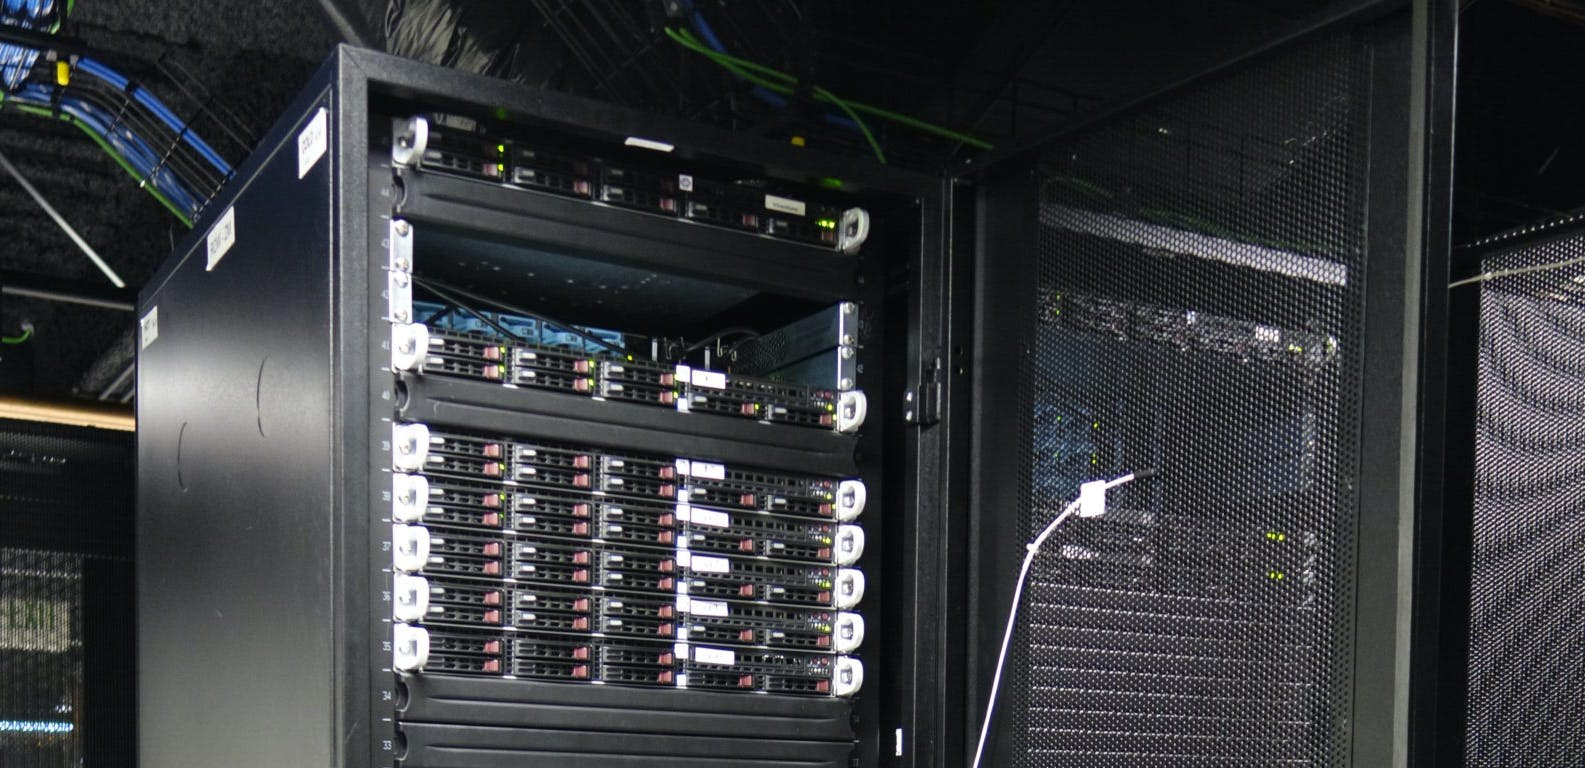 FTP server in a datacenter.